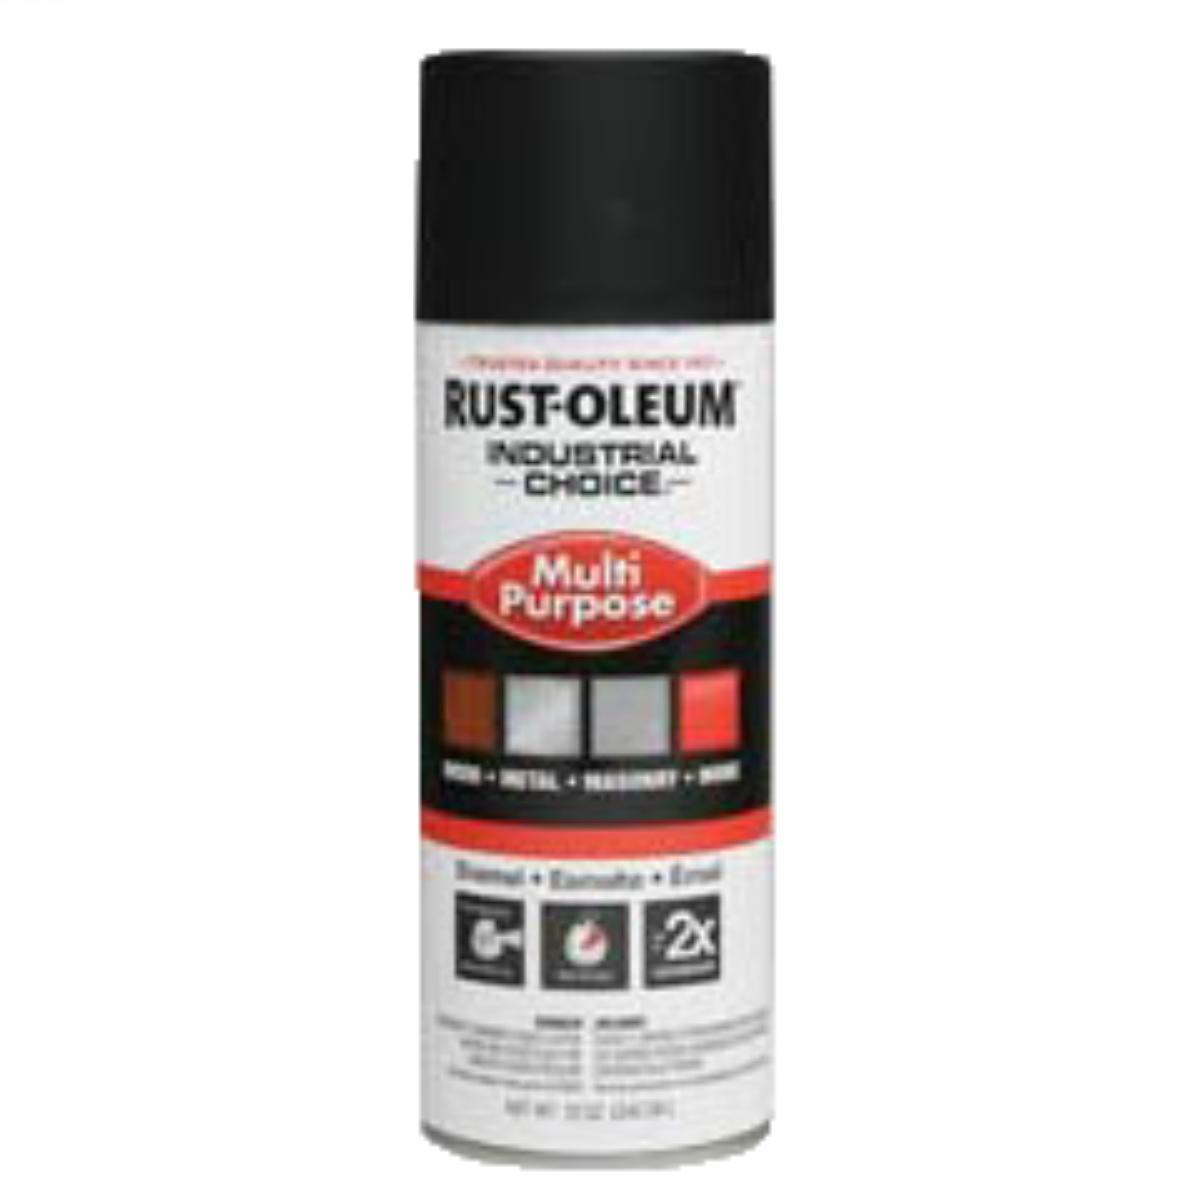 Rust-Oleum 1678830 Industrial Choice 1600 System Enamel Aerosols - Pack of 6